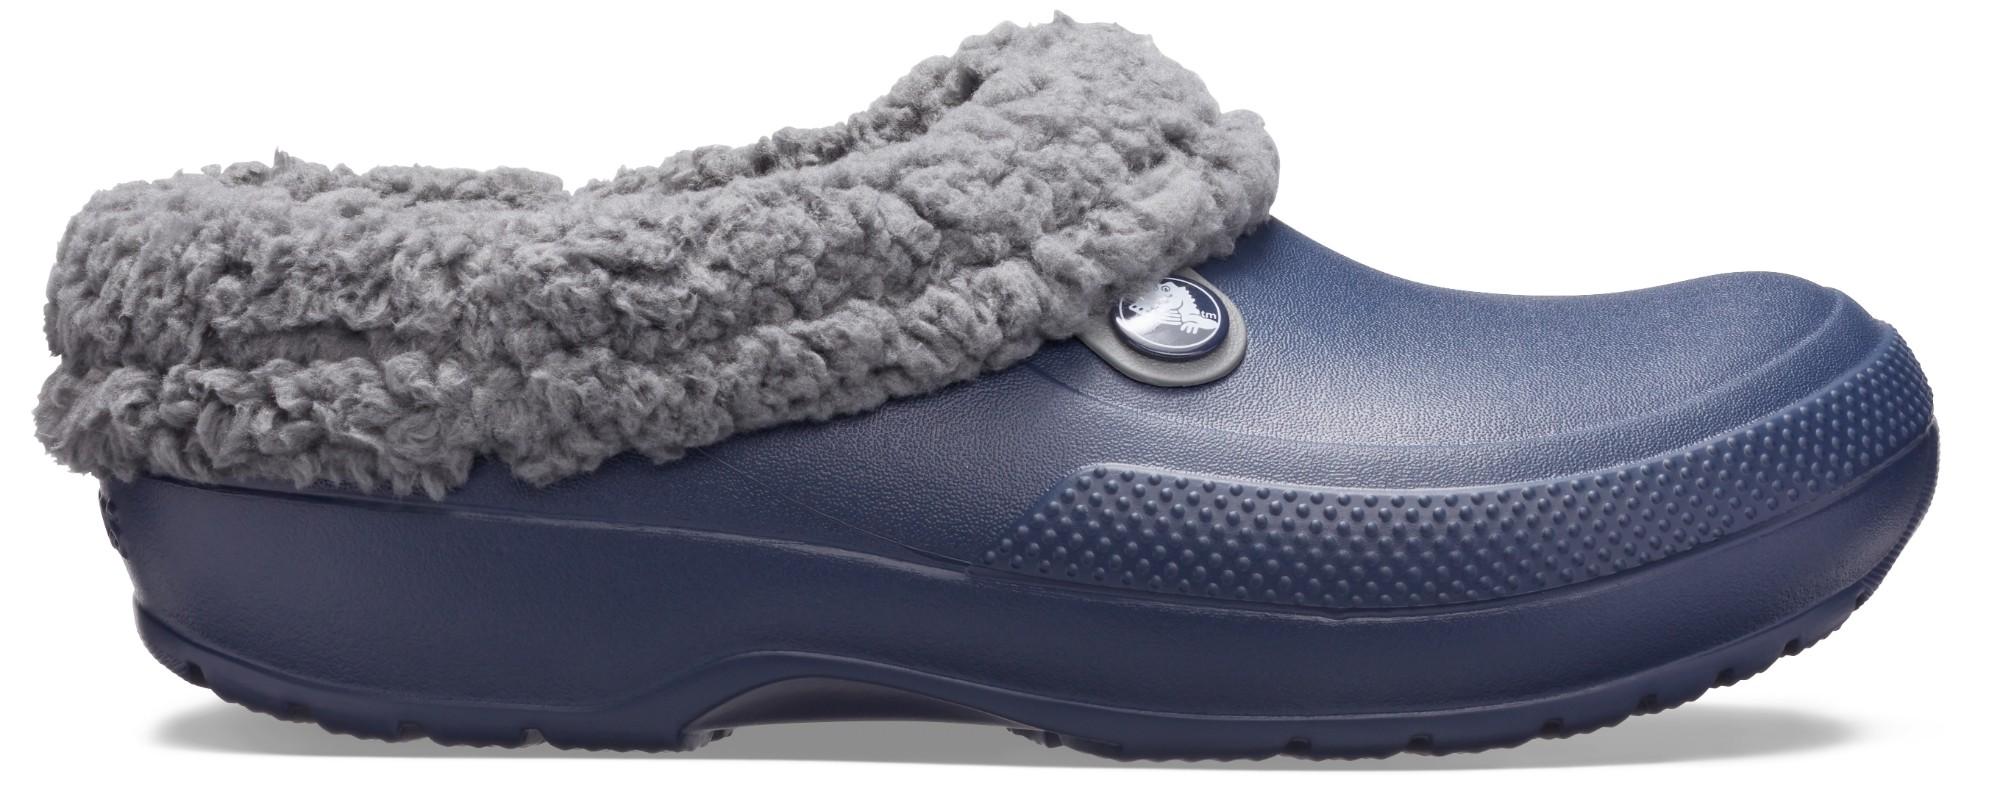 Crocs™ Classic Blitzen III Clog Navy/Slate Grey 47,5